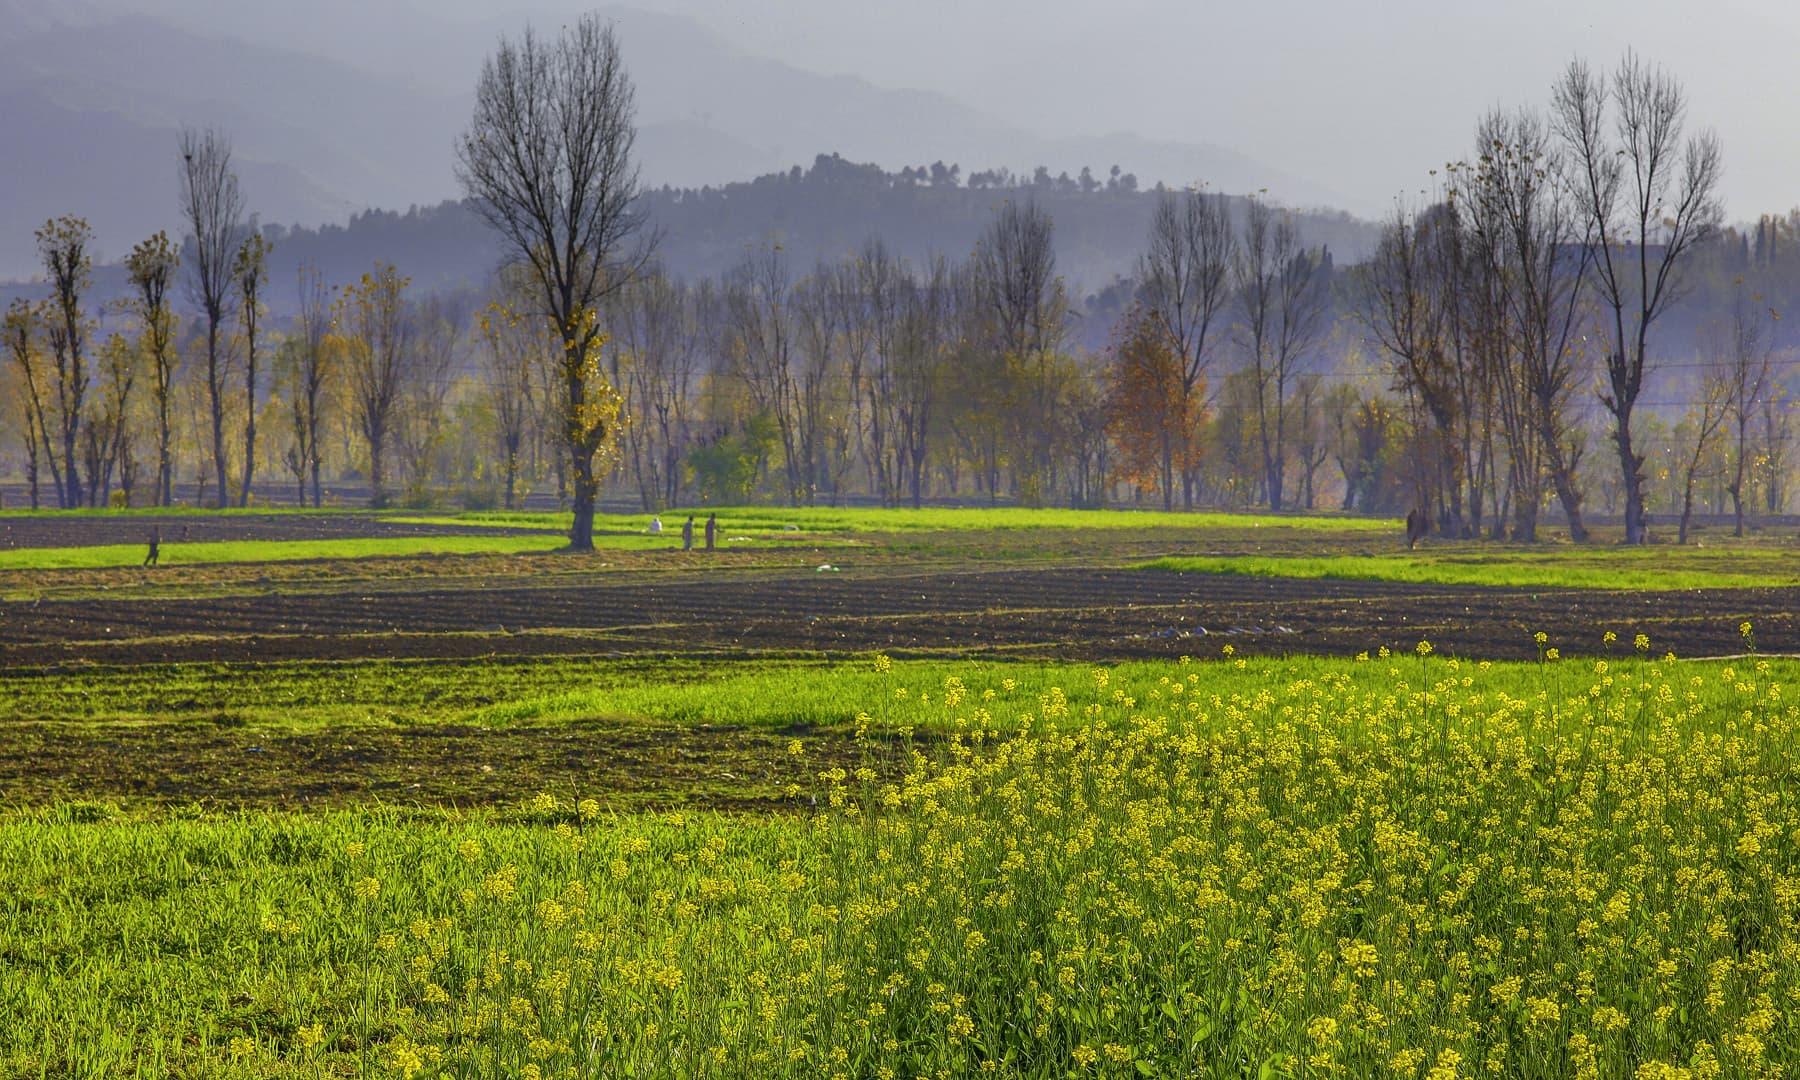 خوازہ خیلہ، سوات. — فوٹو سید مہدی بخاری۔